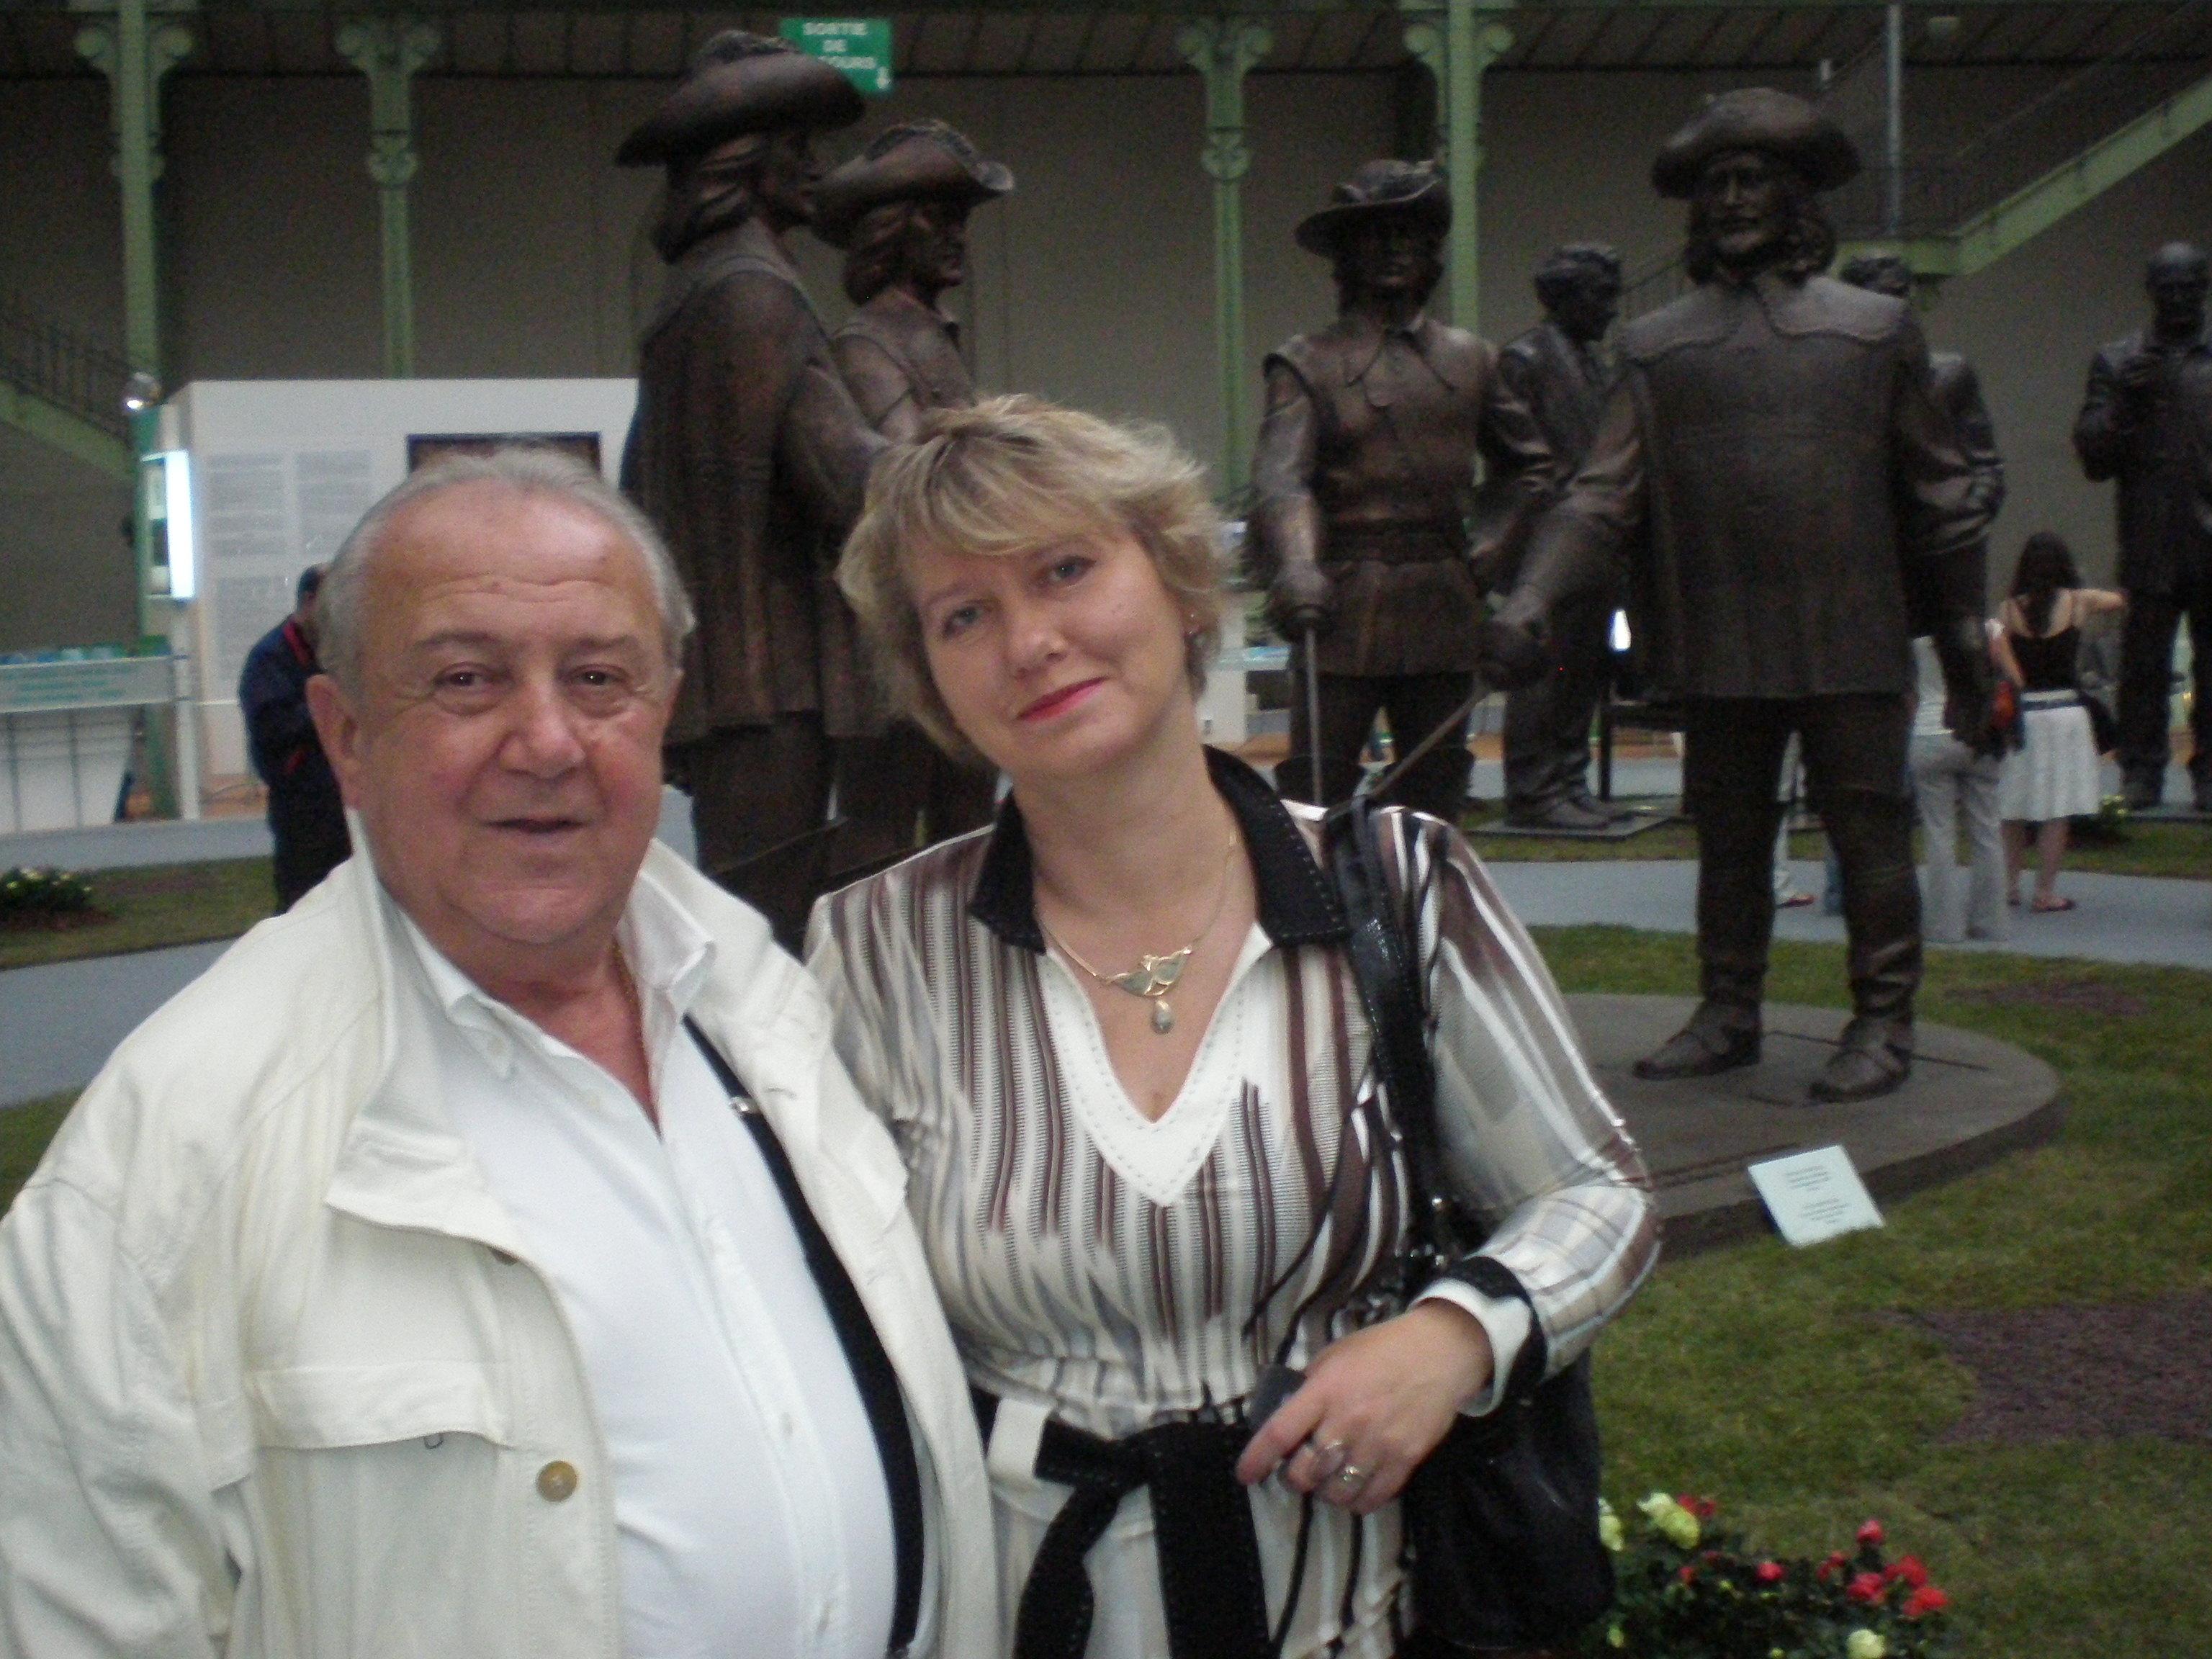 Zurab Tsereteli et Anna Filimonova au Grand Palais avant l'exposition Grandes Signatures Petits Formats